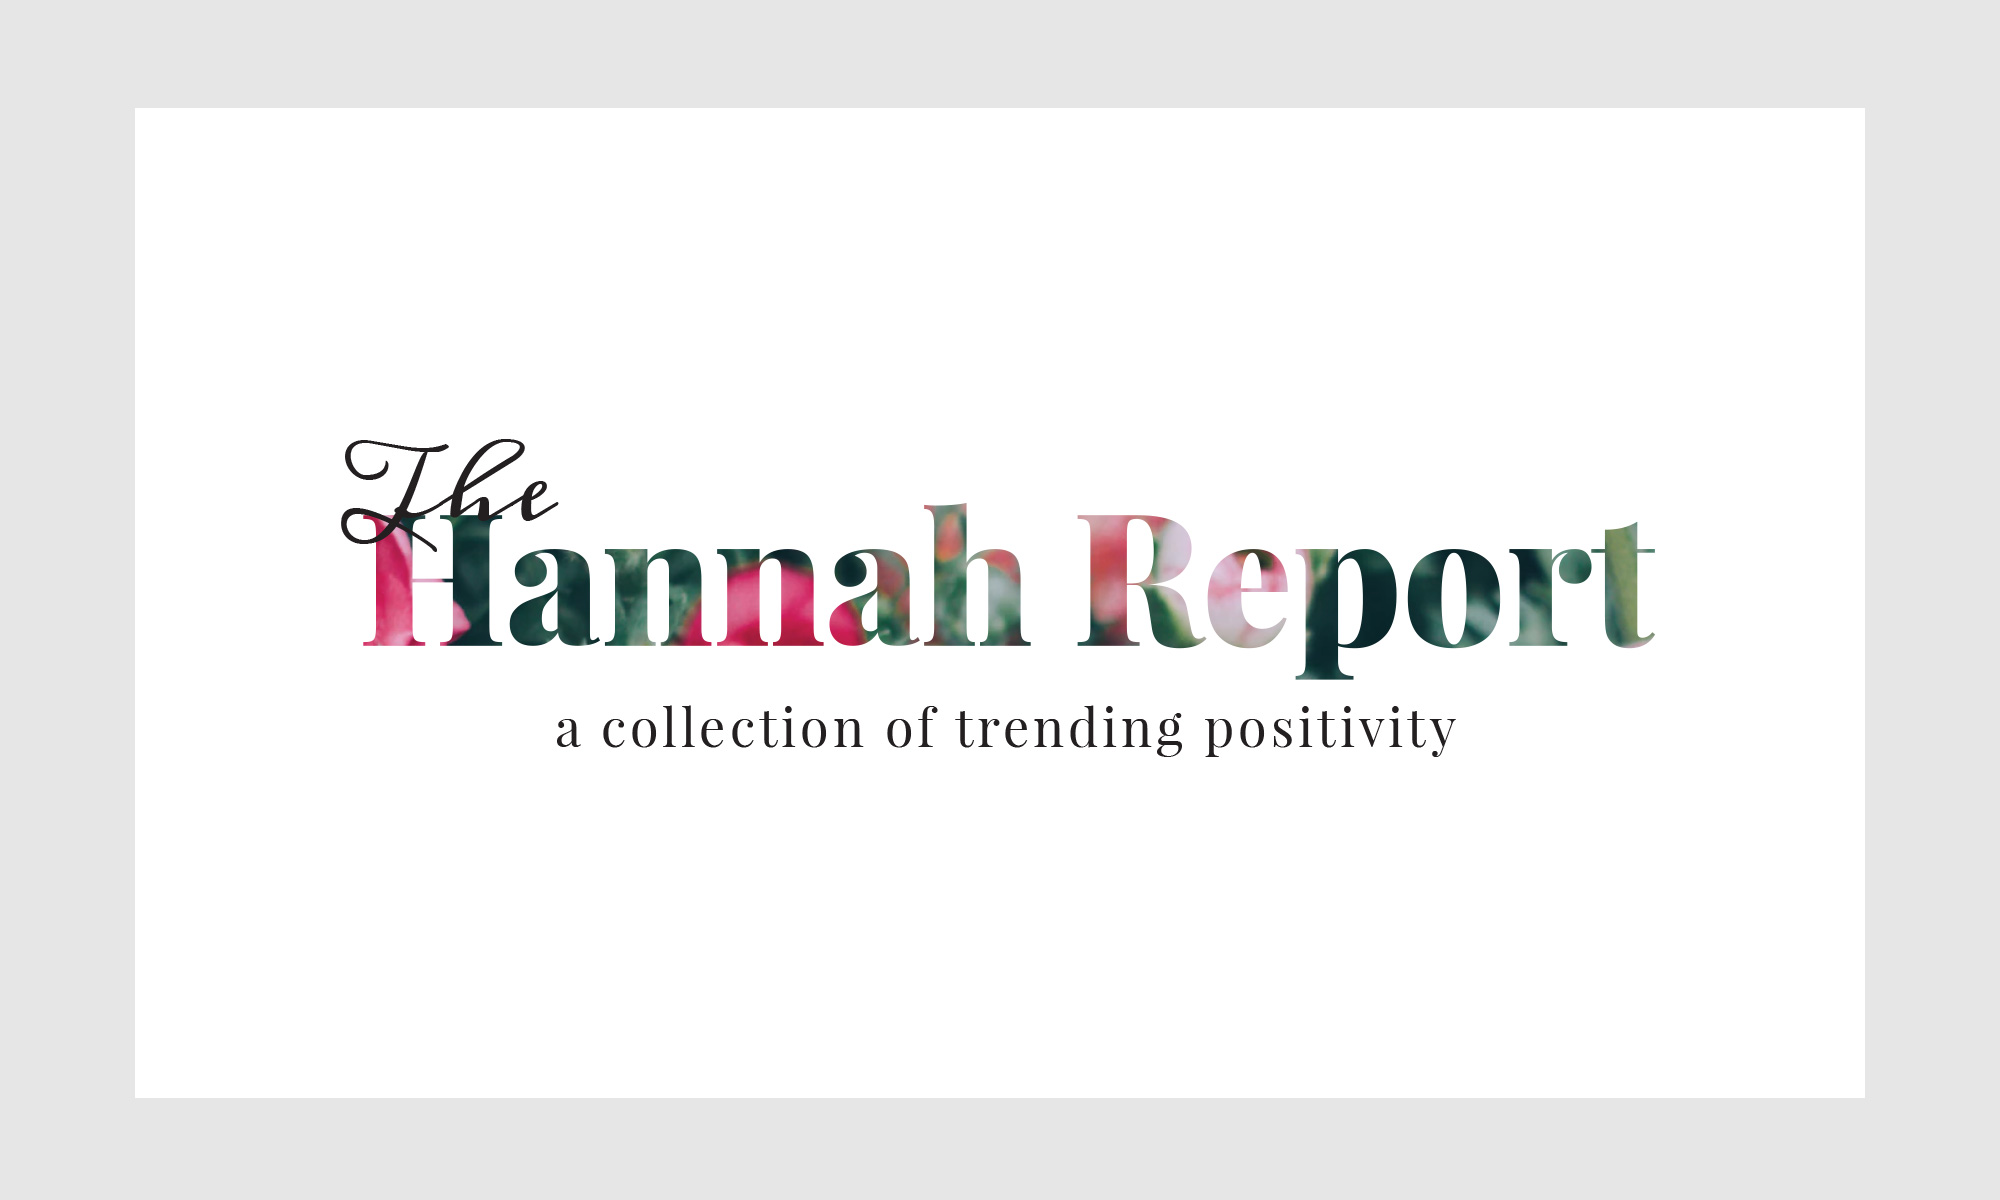 Logo for The Hannah Report, a positivity-focused news website